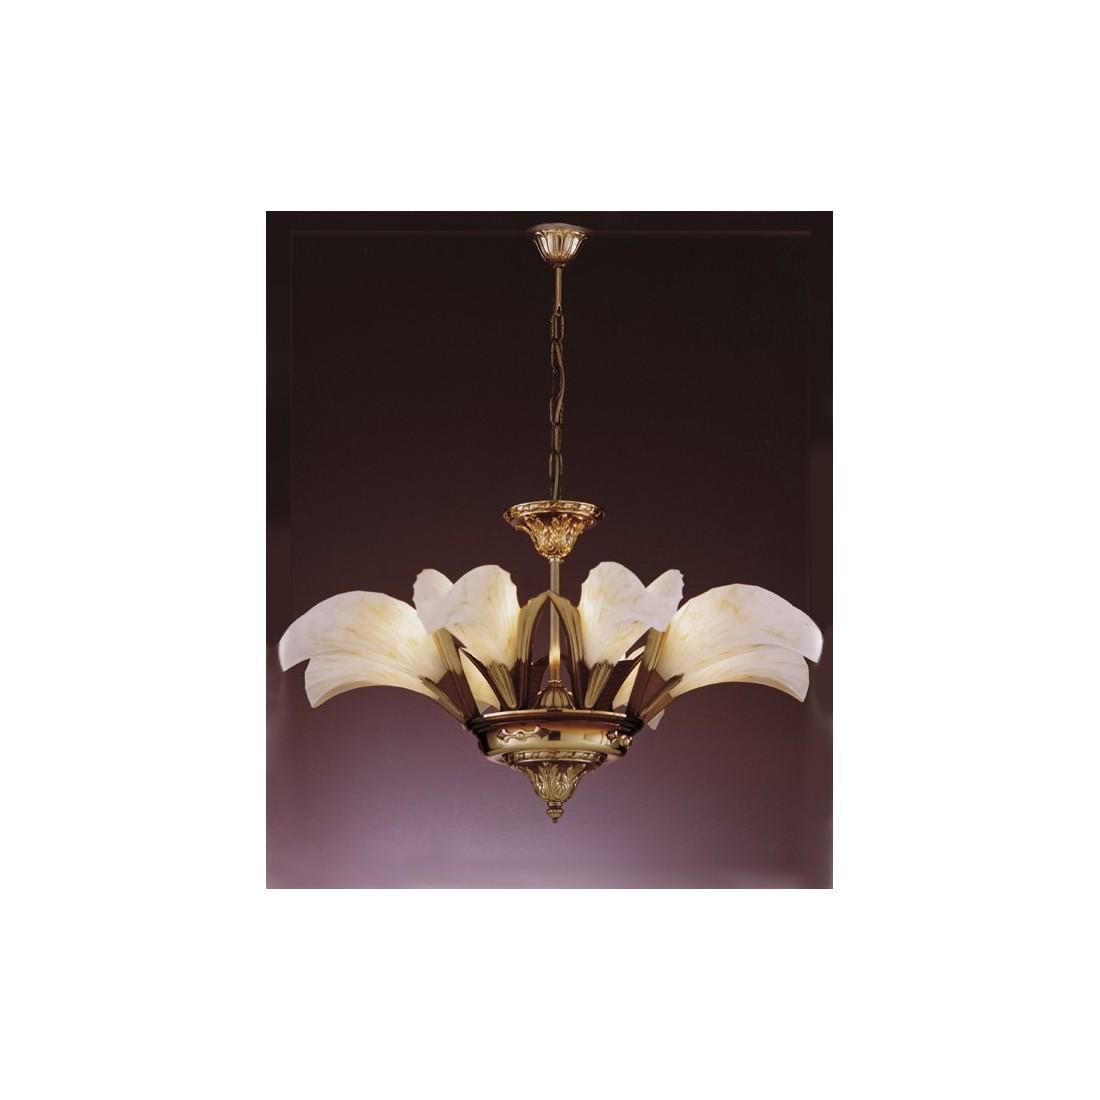 L mpara de bronce xxl distribuidores oficiales - Lamparas clasicas modernas ...